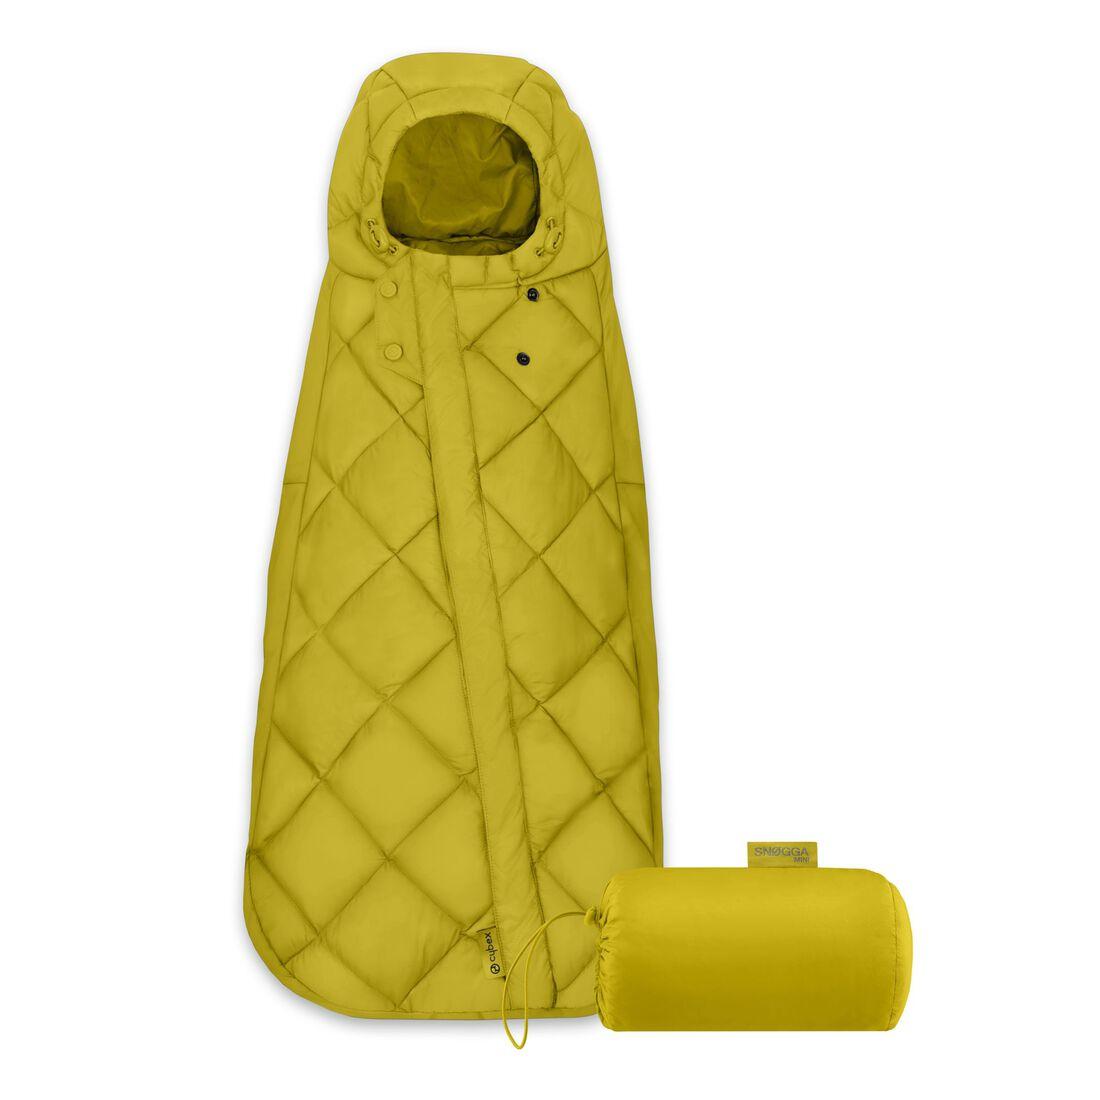 CYBEX Snogga Mini - Mustard Yellow in Mustard Yellow large Bild 1